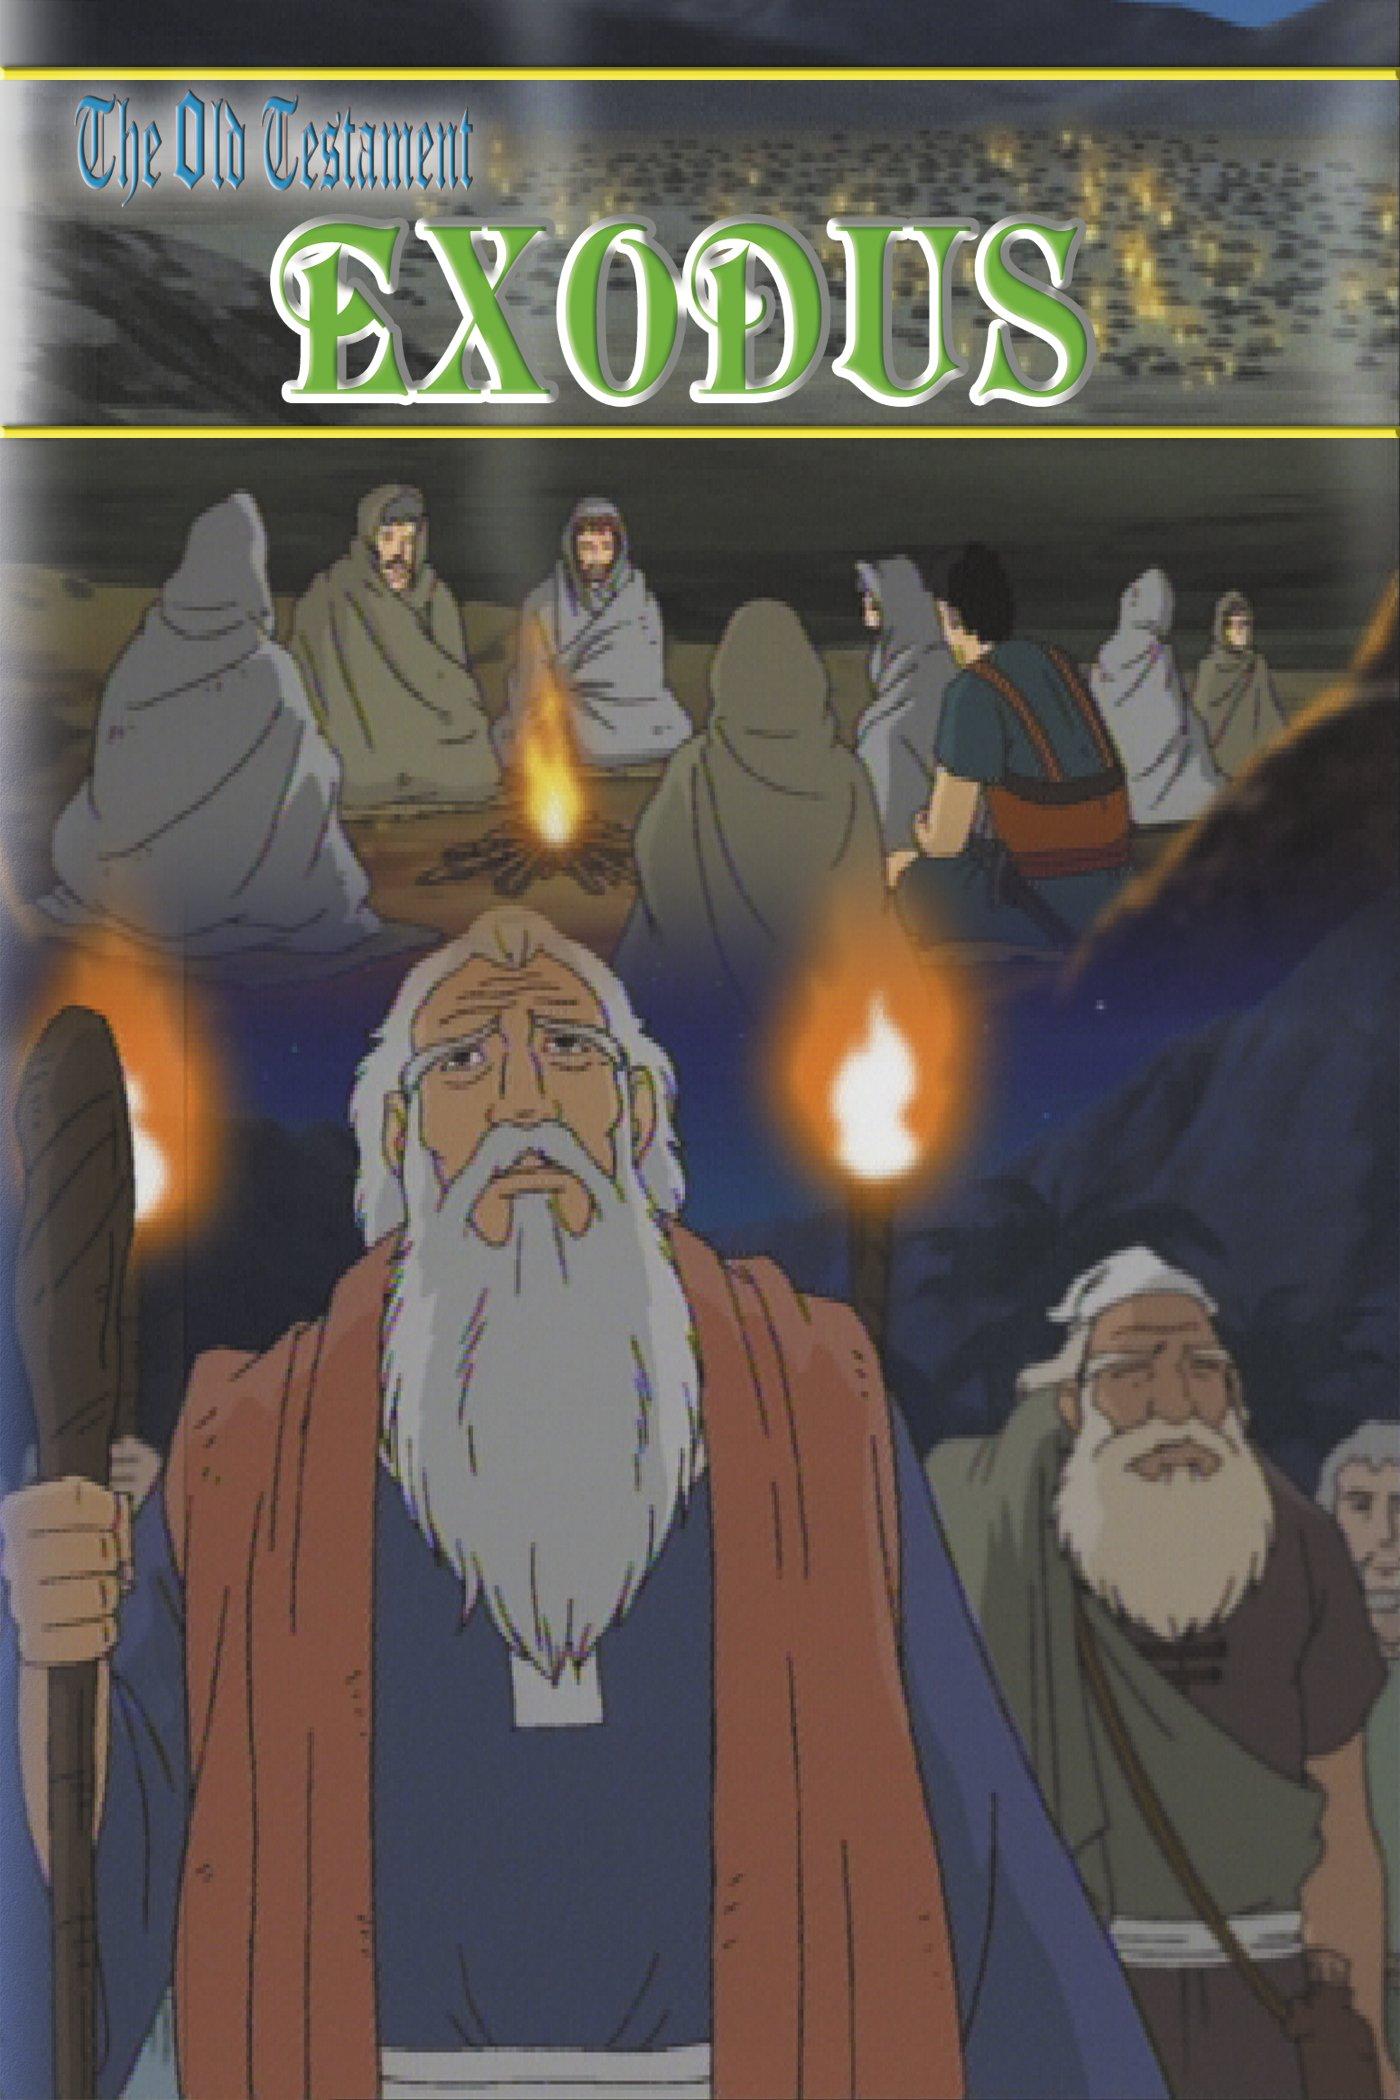 Amazon com: Watch Old Testament IV, Exodus: An Animated